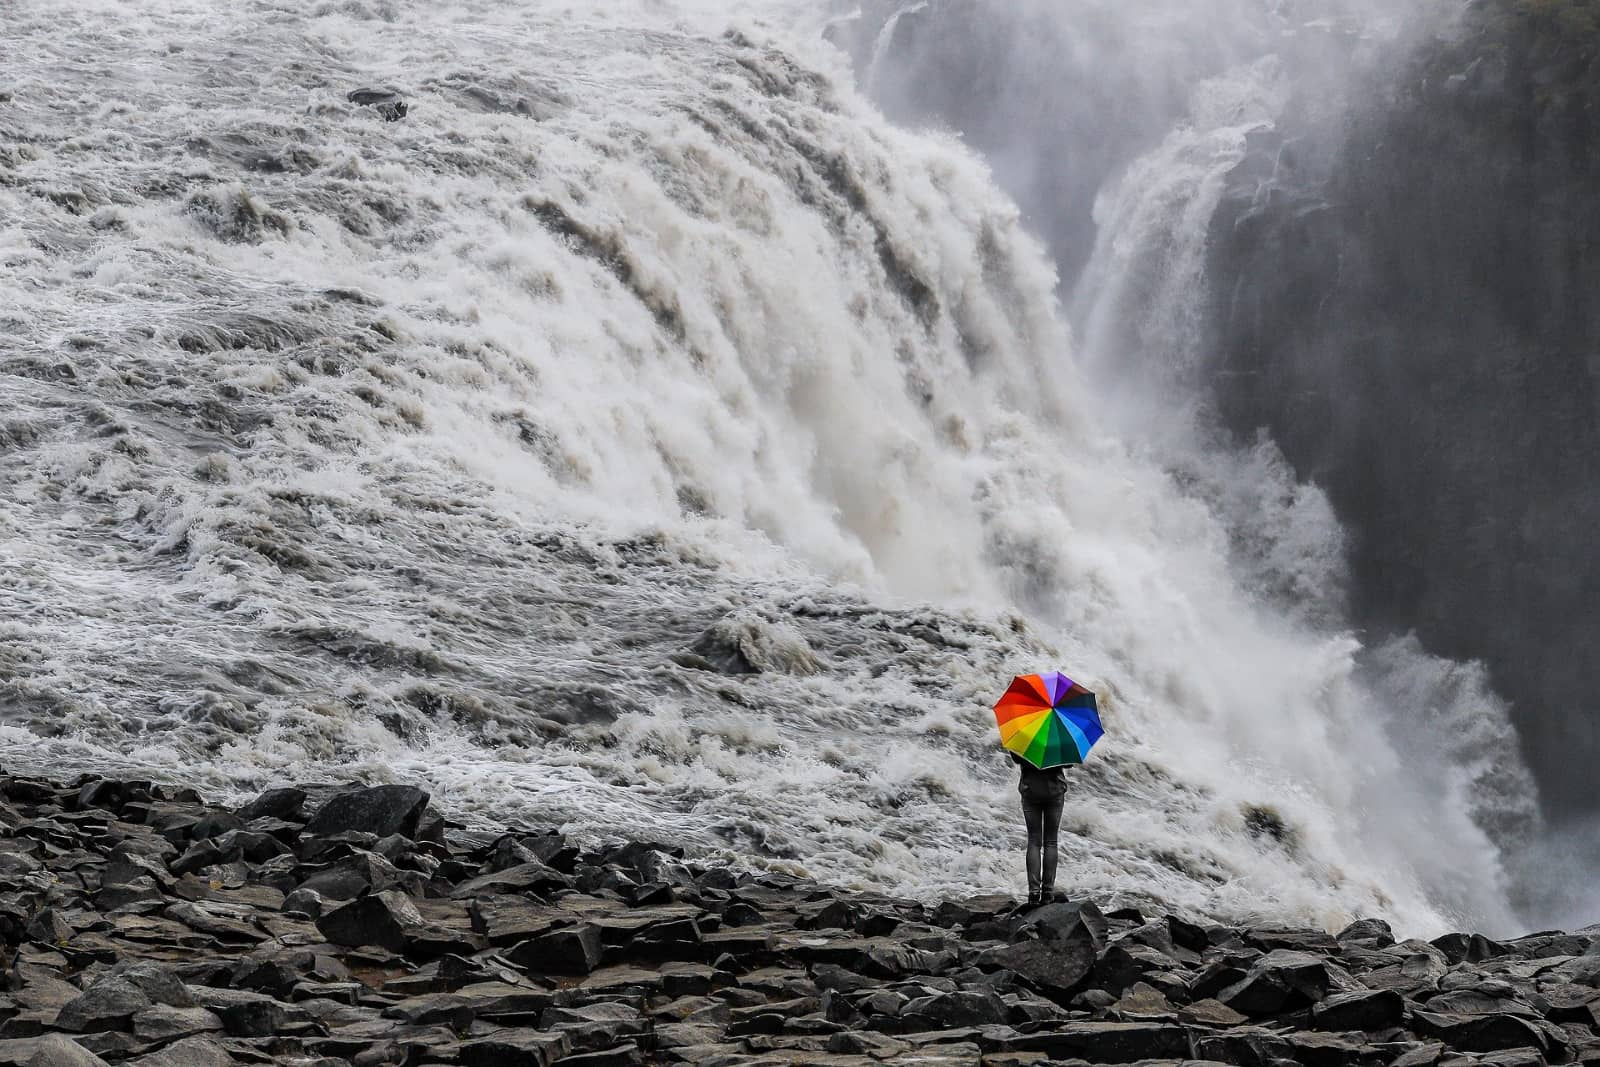 Waterval - Michael Bußmann via Pixabay